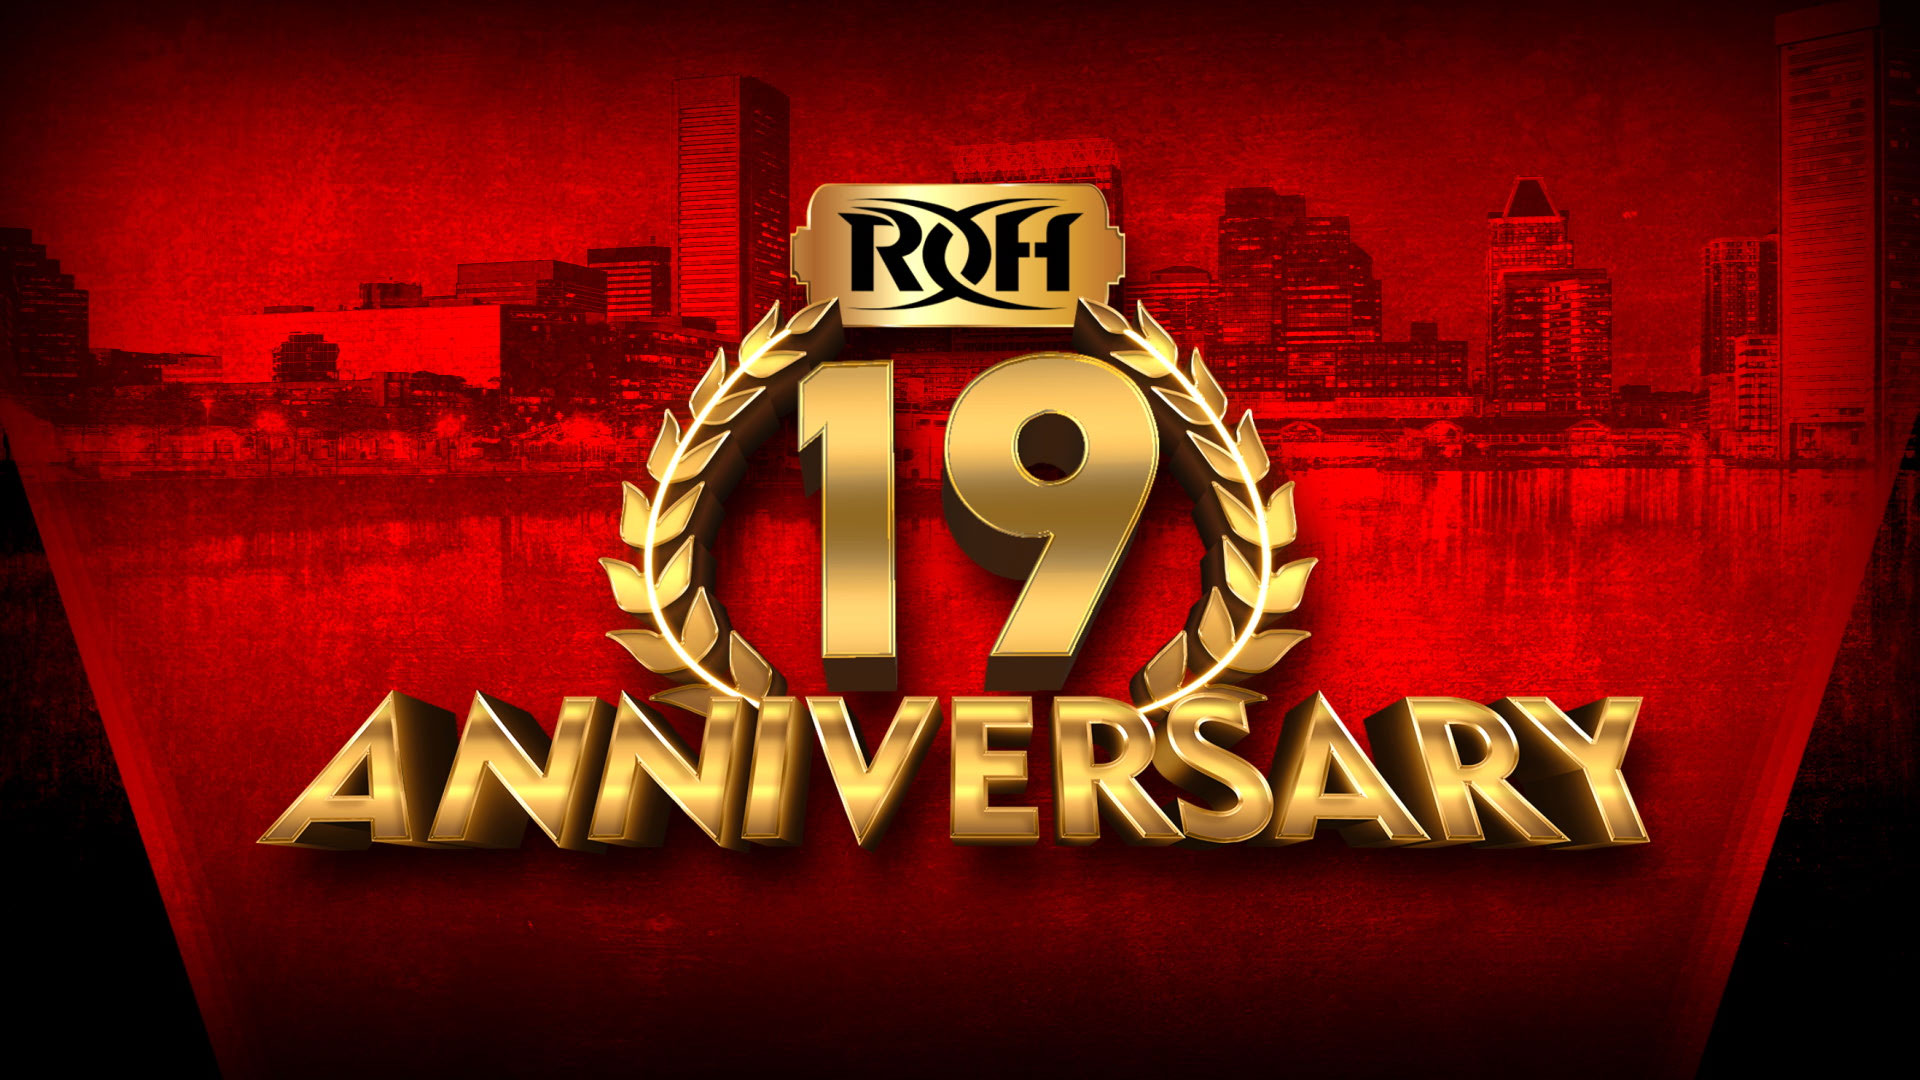 ROH anuncia data do próximo PPV